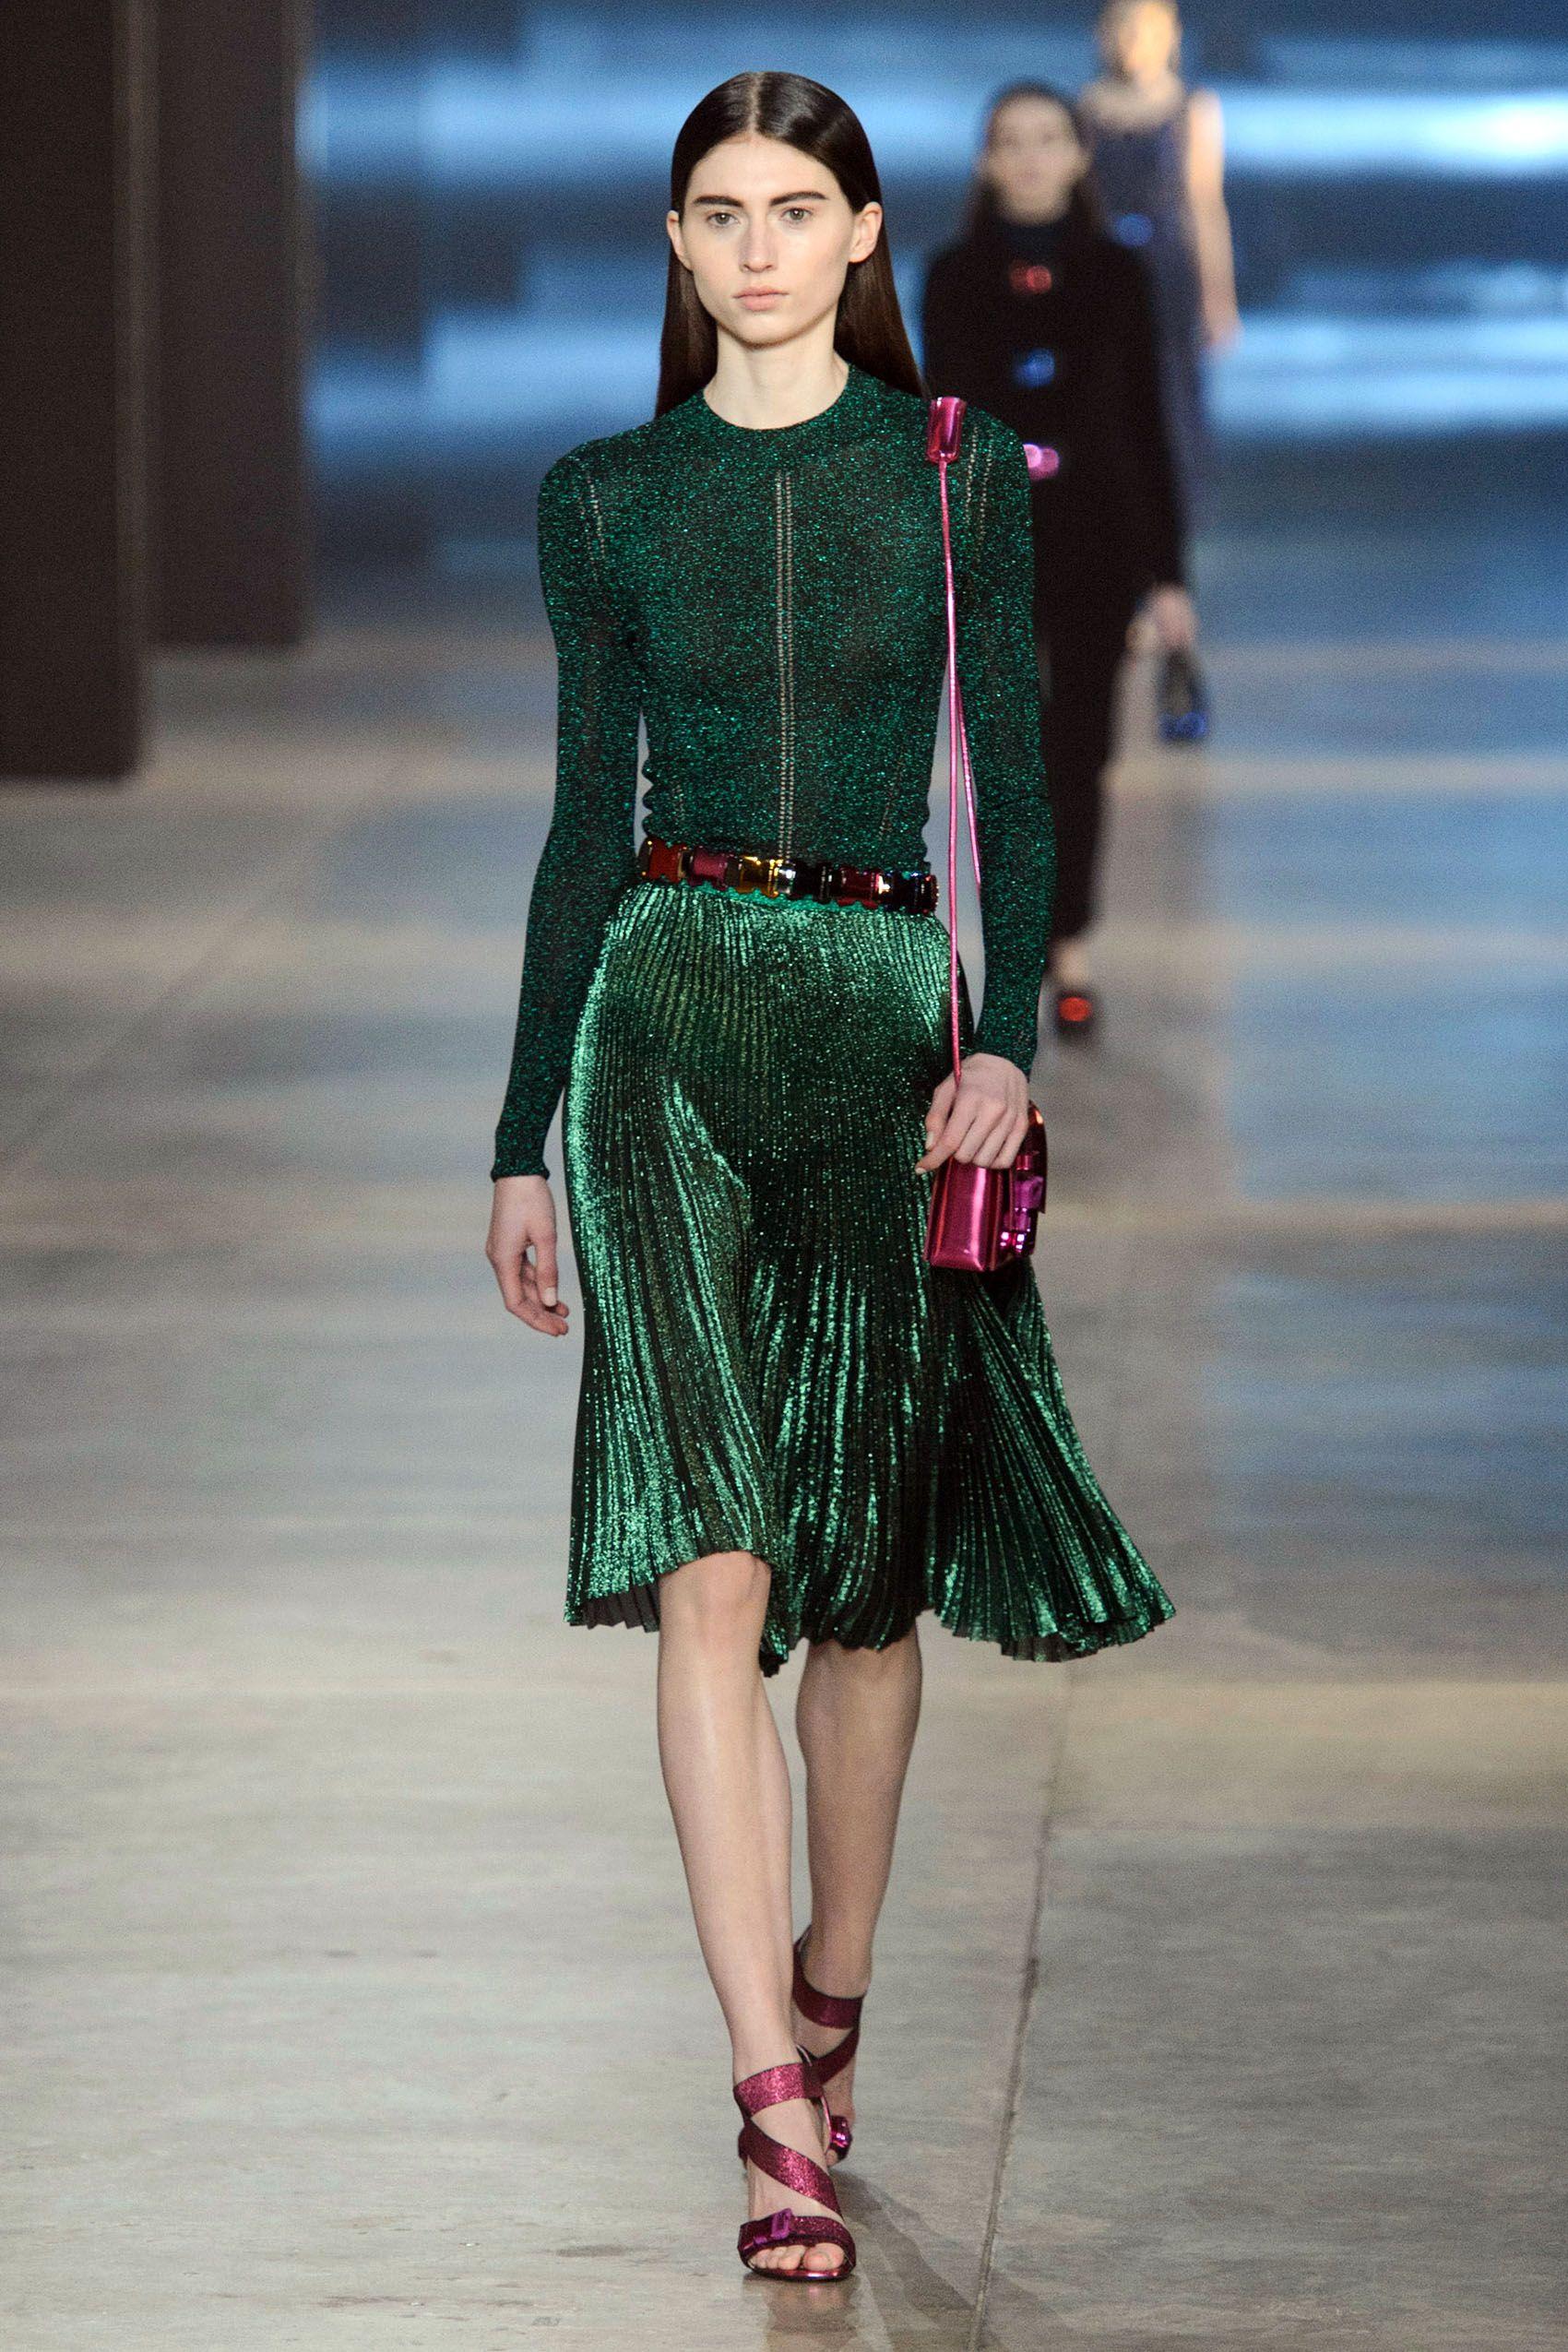 The 40 Best Runway Looks From London Fashion Week (SoFar) advise